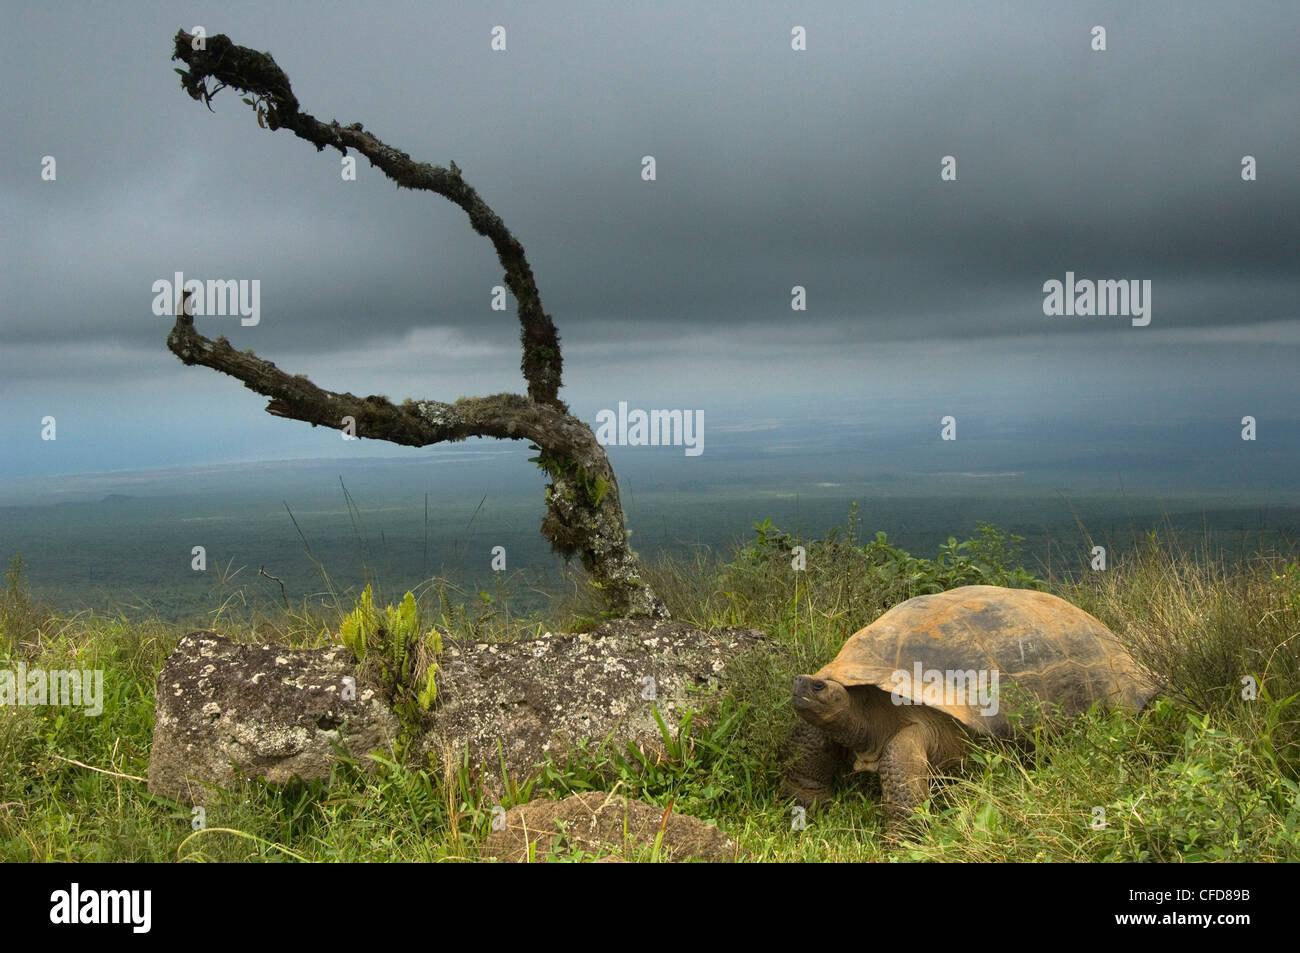 Galapagos-Riesenschildkröte am Rand des Vulkan Alcedo, Isabela Island, Galapagos-Inseln, Ecuador, Südamerika. Stockbild